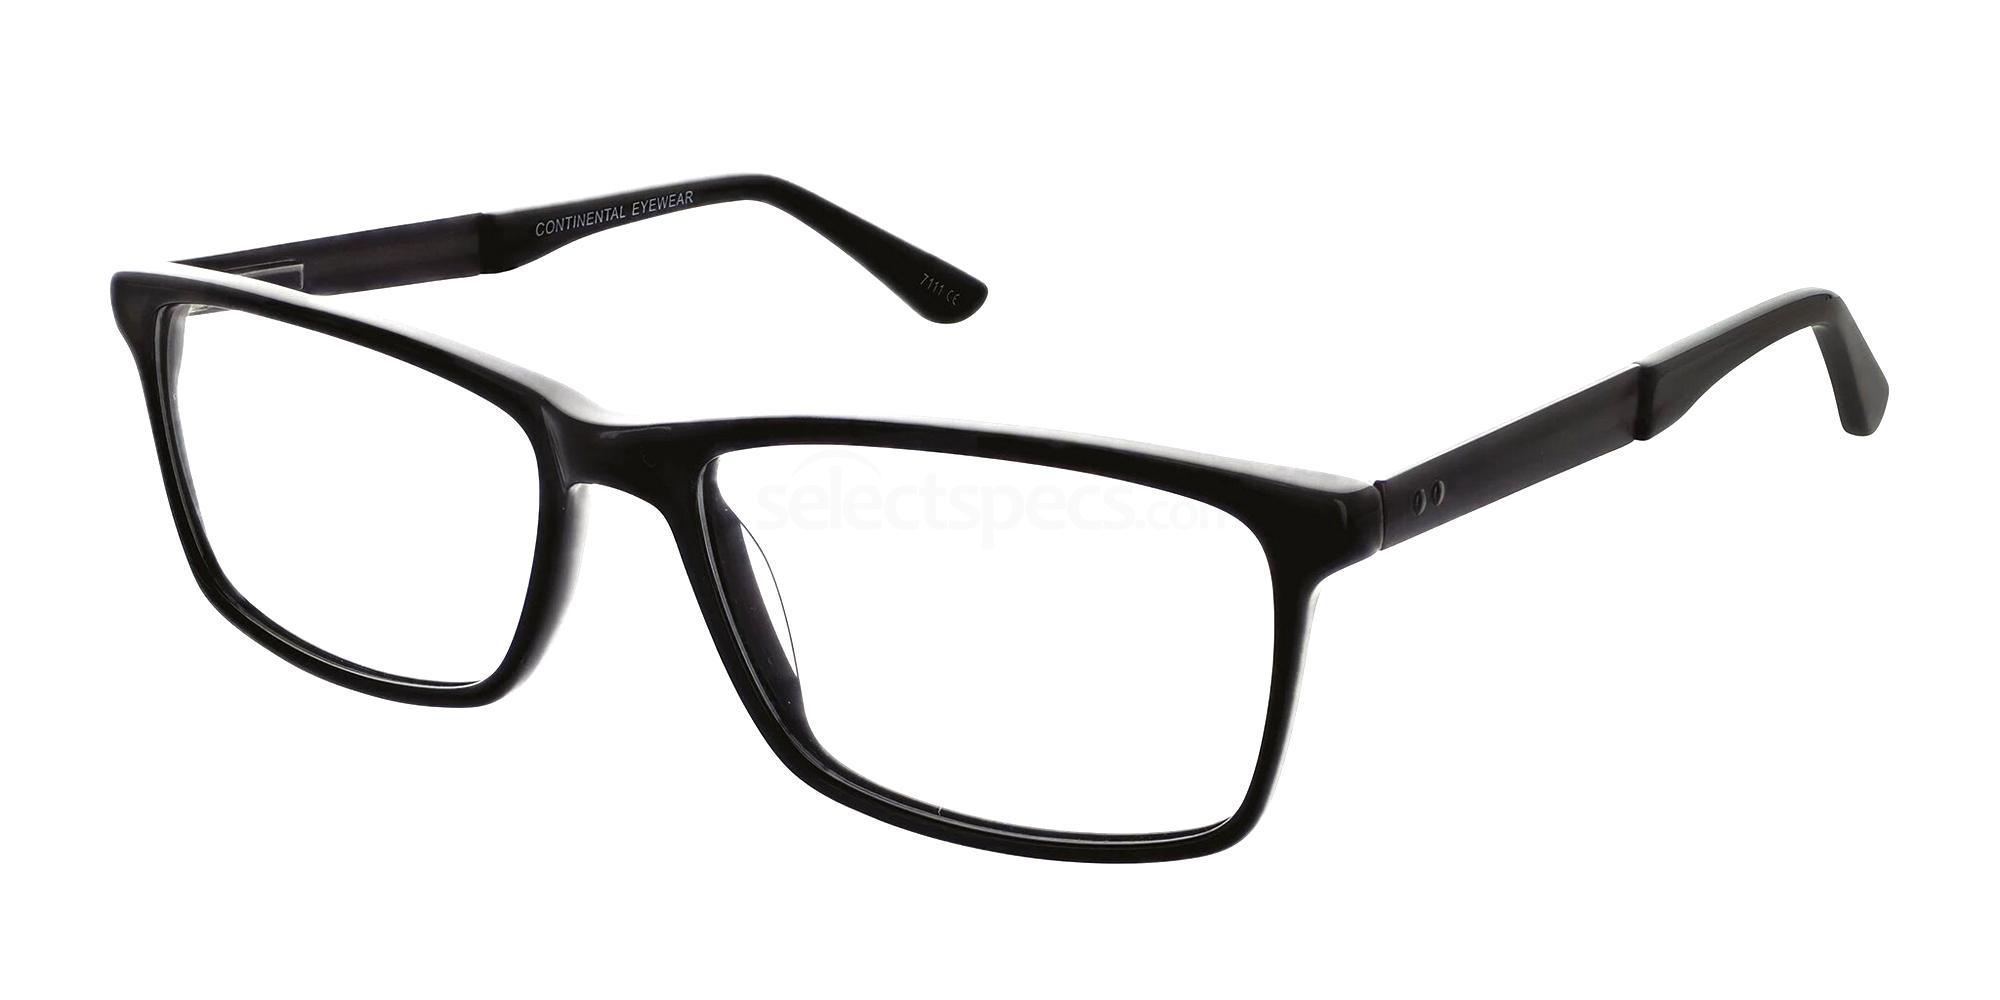 Black 83 Glasses, Zenith Zest